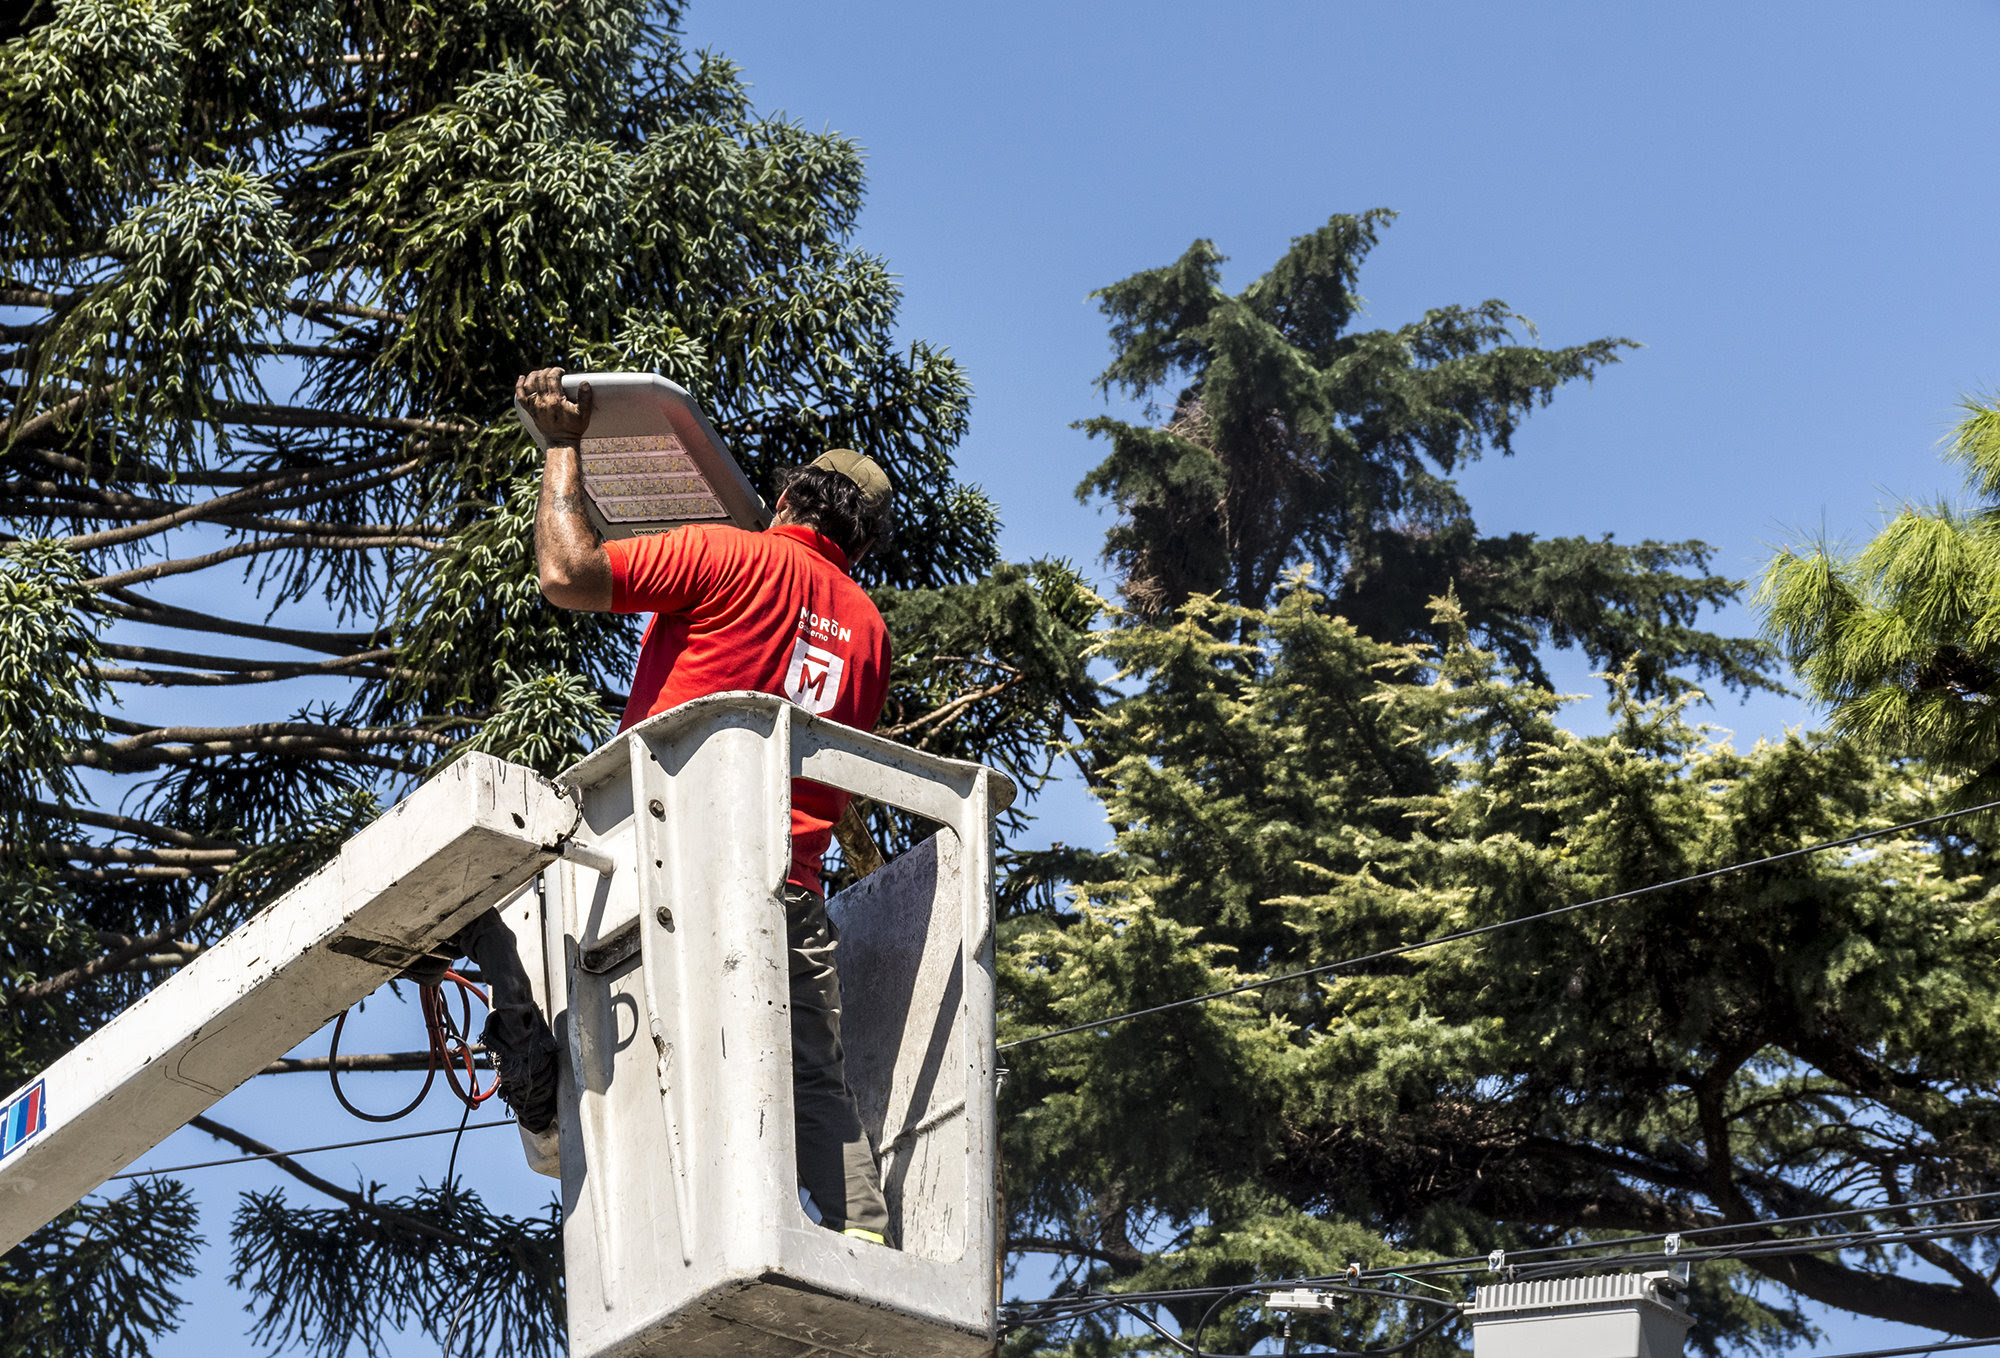 Histórica reconversión lumínica en Morón: se instalaron 5000 luces LED